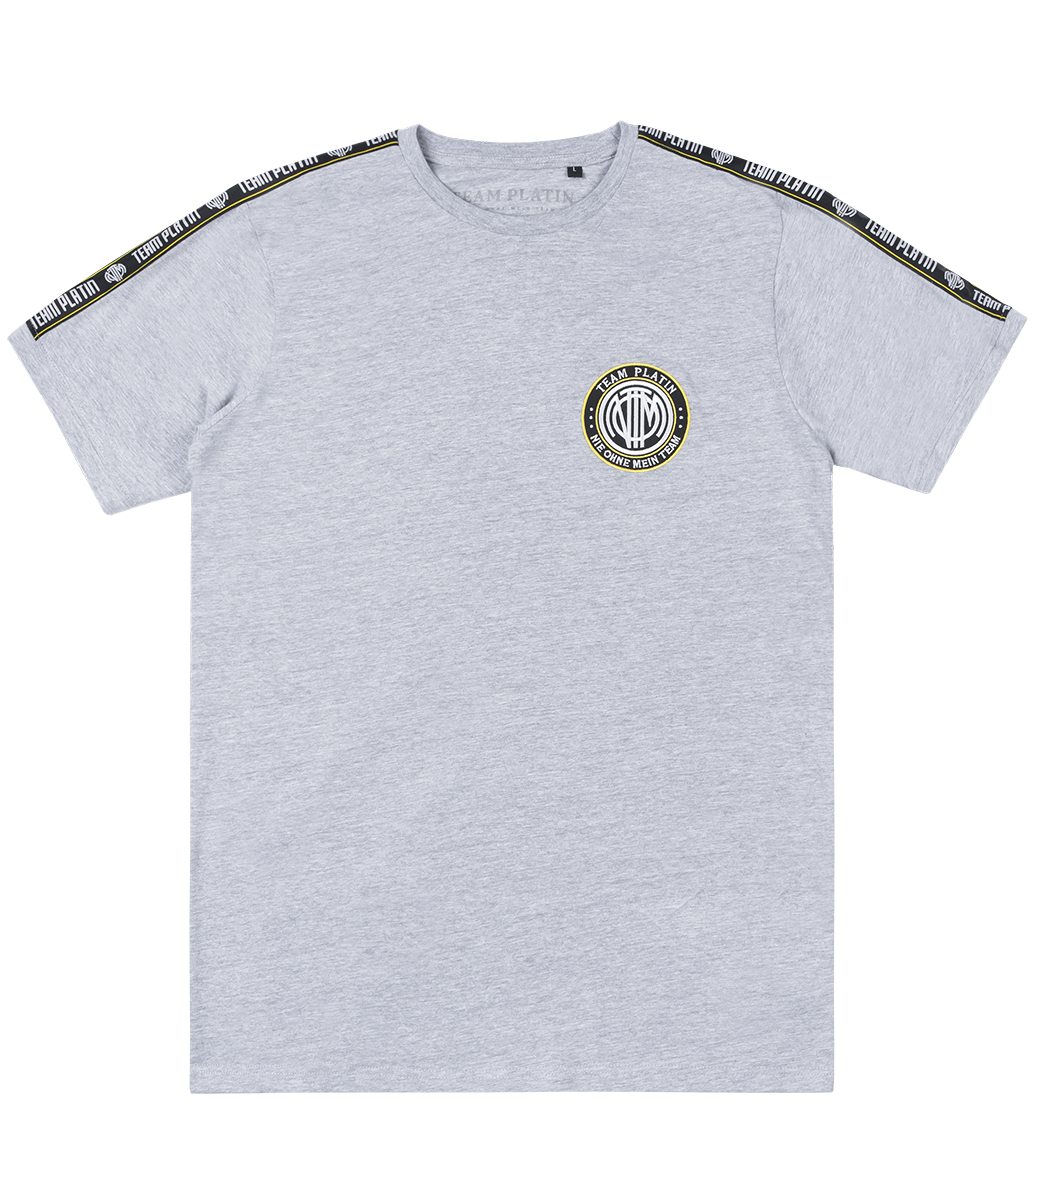 Team Platin Classic Stripe Shirt NeonGrey   Official Team Platin Site Athletic Streetwear & Urban Fashion #PlatinSeason